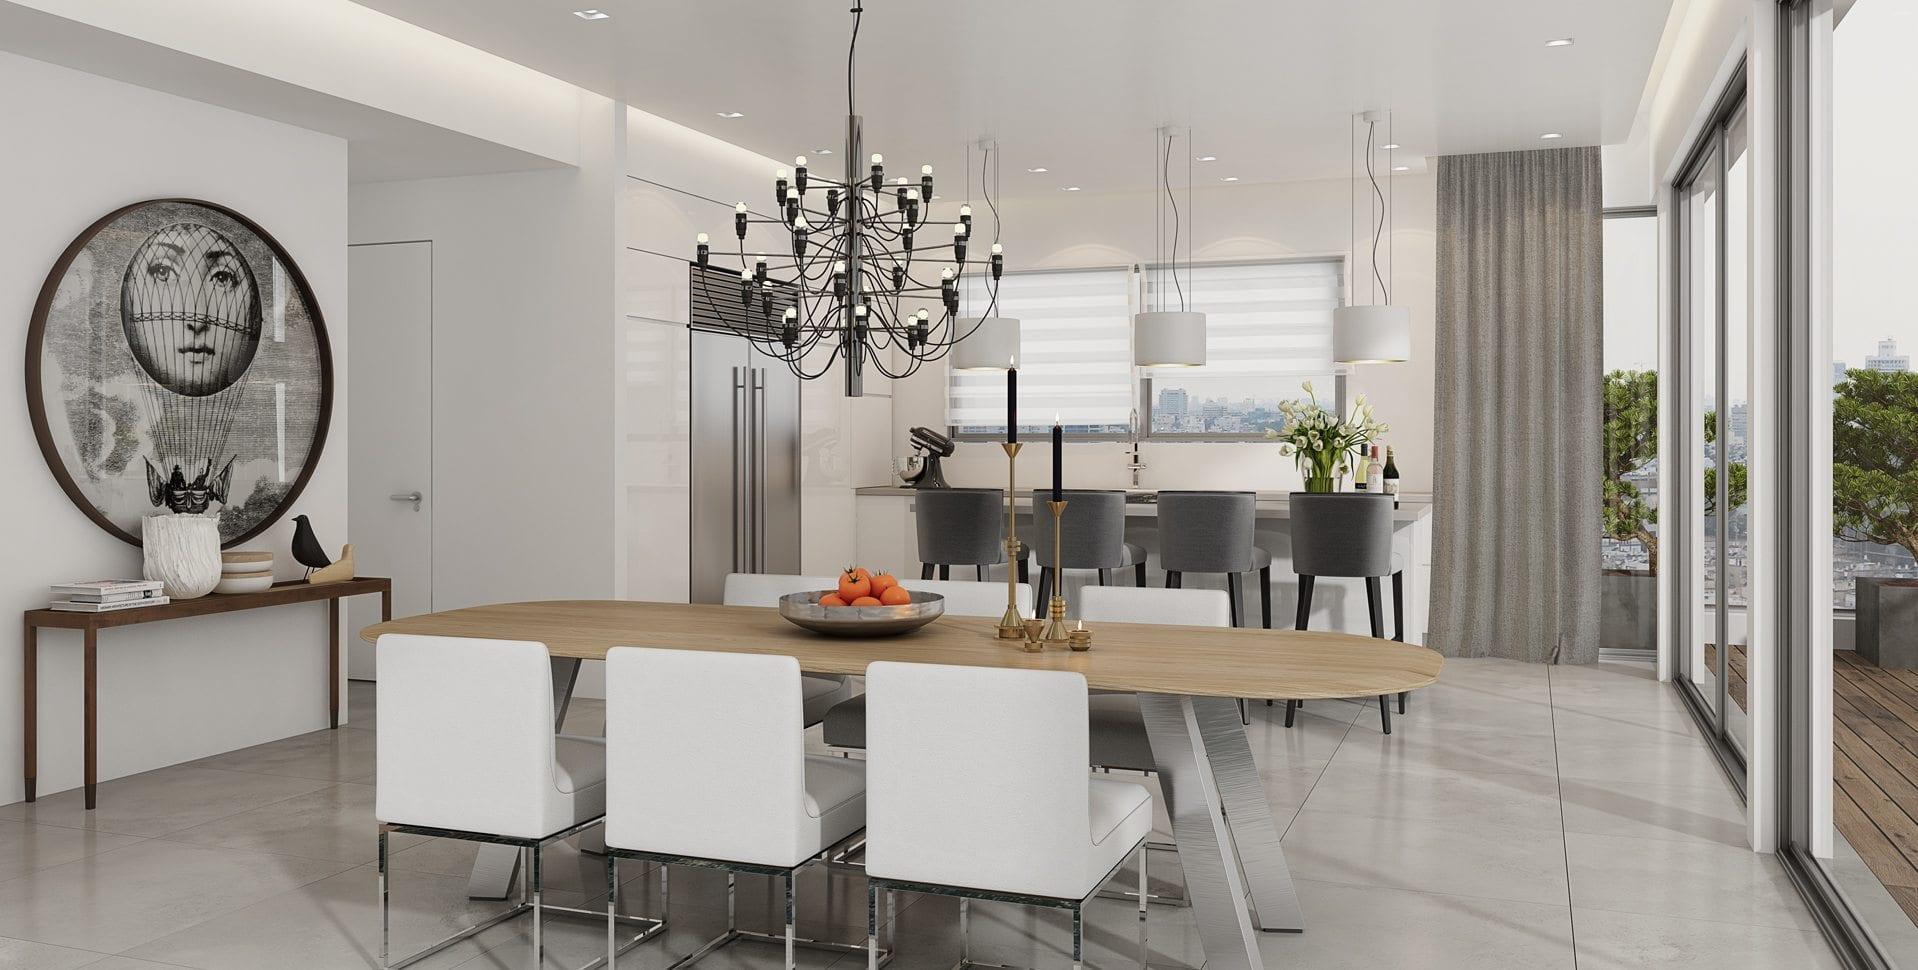 Maayan-Golan_Architectural-Visualization_ penthouse-interior-visualization_kitchen-dining_design-Lior Reuter_03